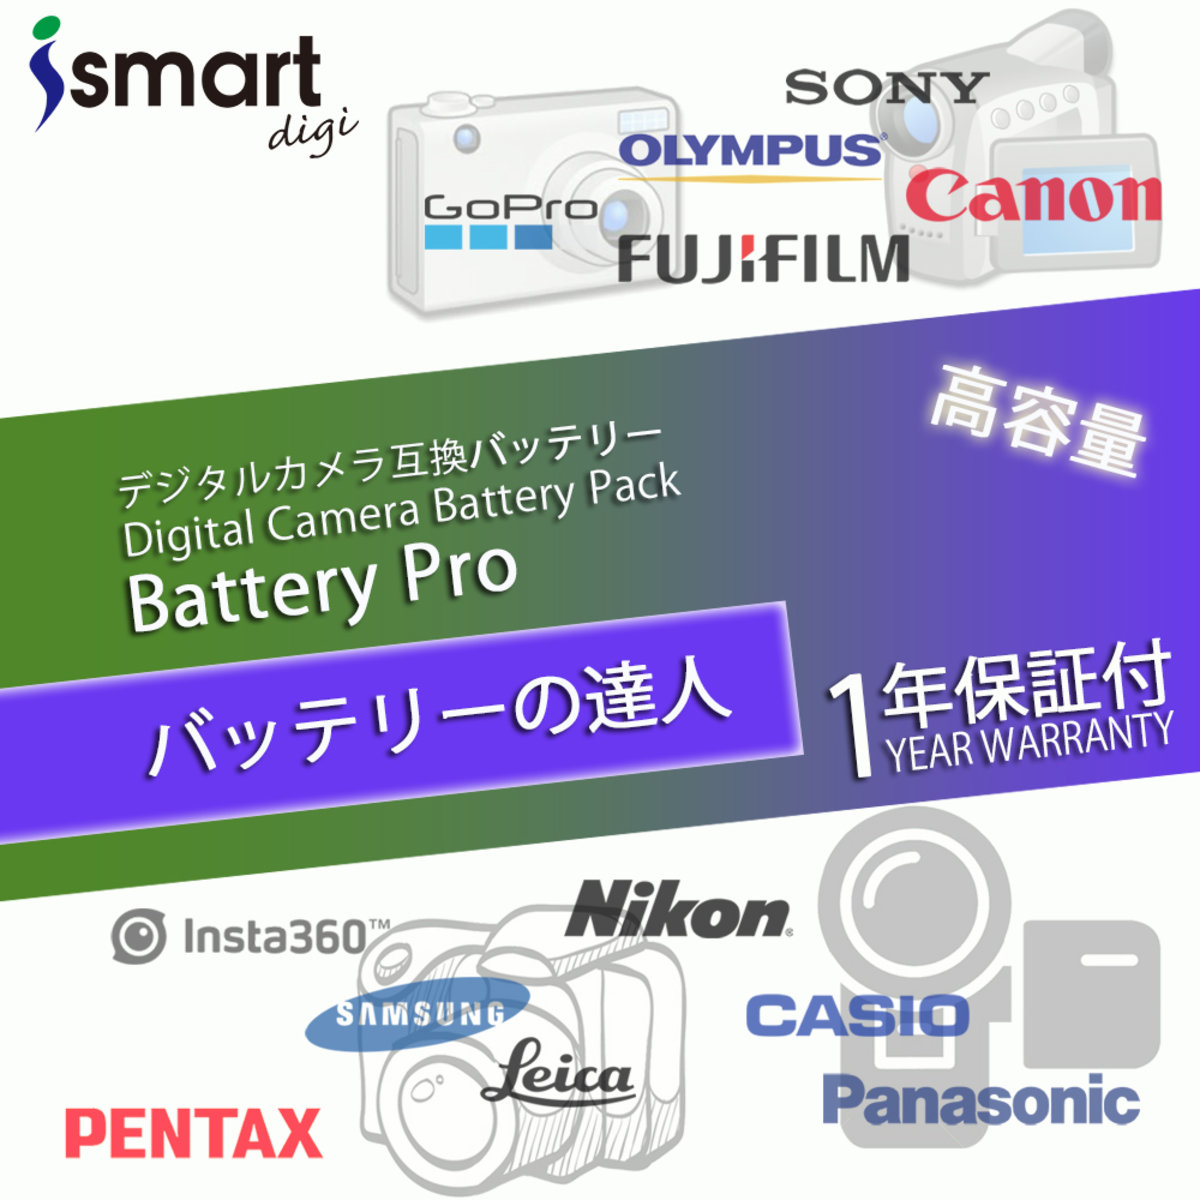 Sony Digital Camera Battery (For:DSC-HX9V, Cyber-shot DSC-WX1, DSC-HX5V, DSC-HX55,DSC-HX5)